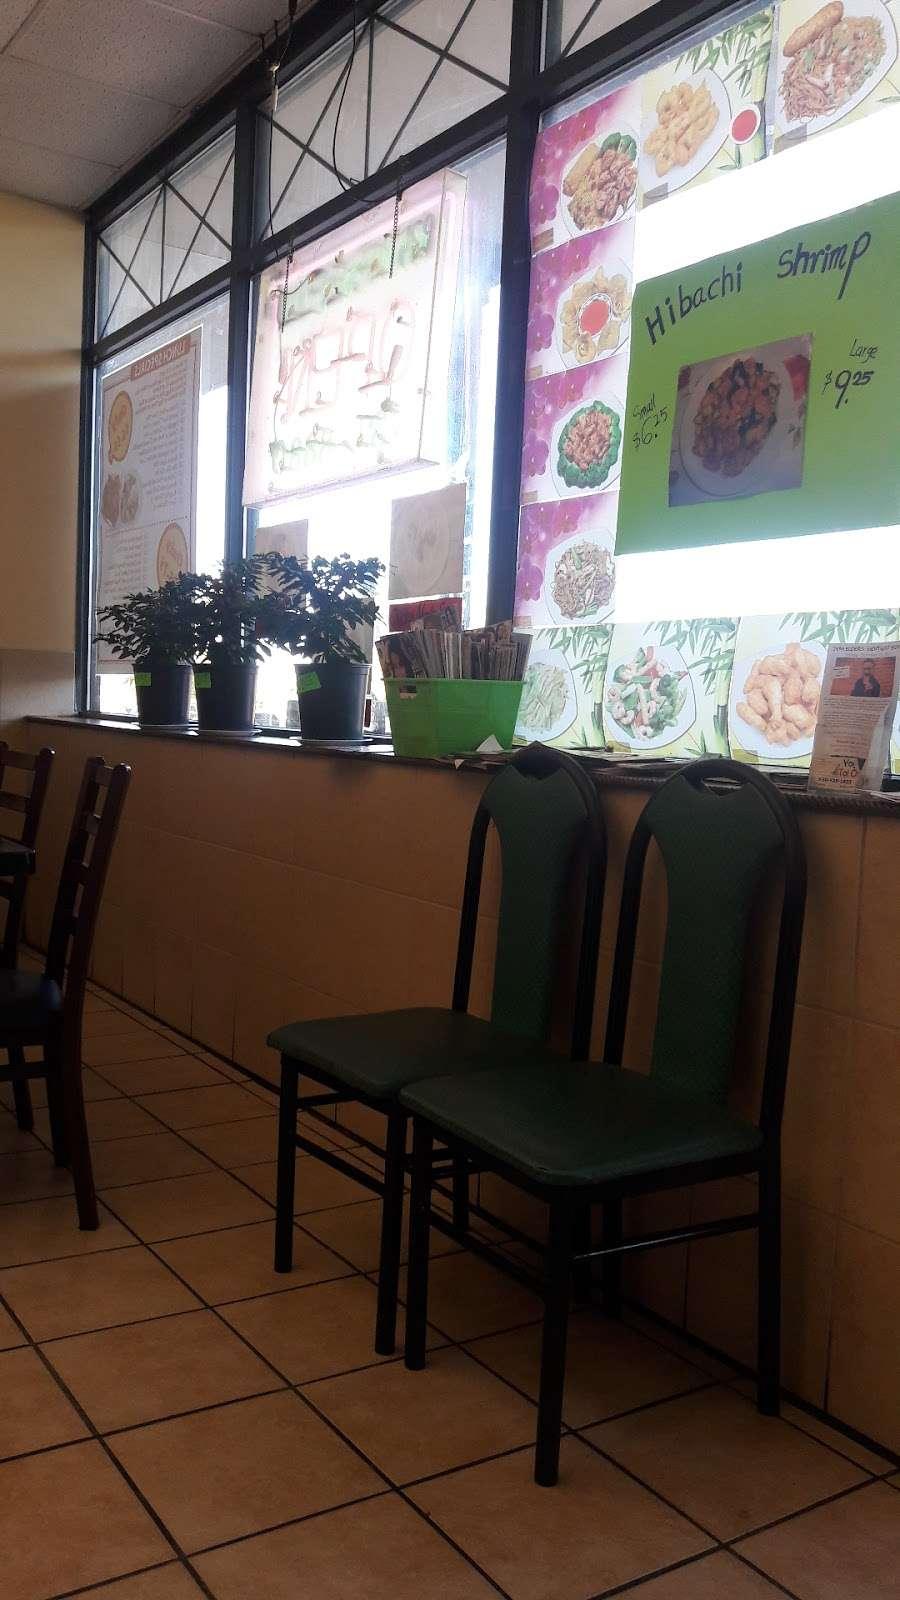 King Wok 59 - restaurant  | Photo 4 of 10 | Address: 956 N Neltnor Blvd, West Chicago, IL 60185, USA | Phone: (630) 231-8881